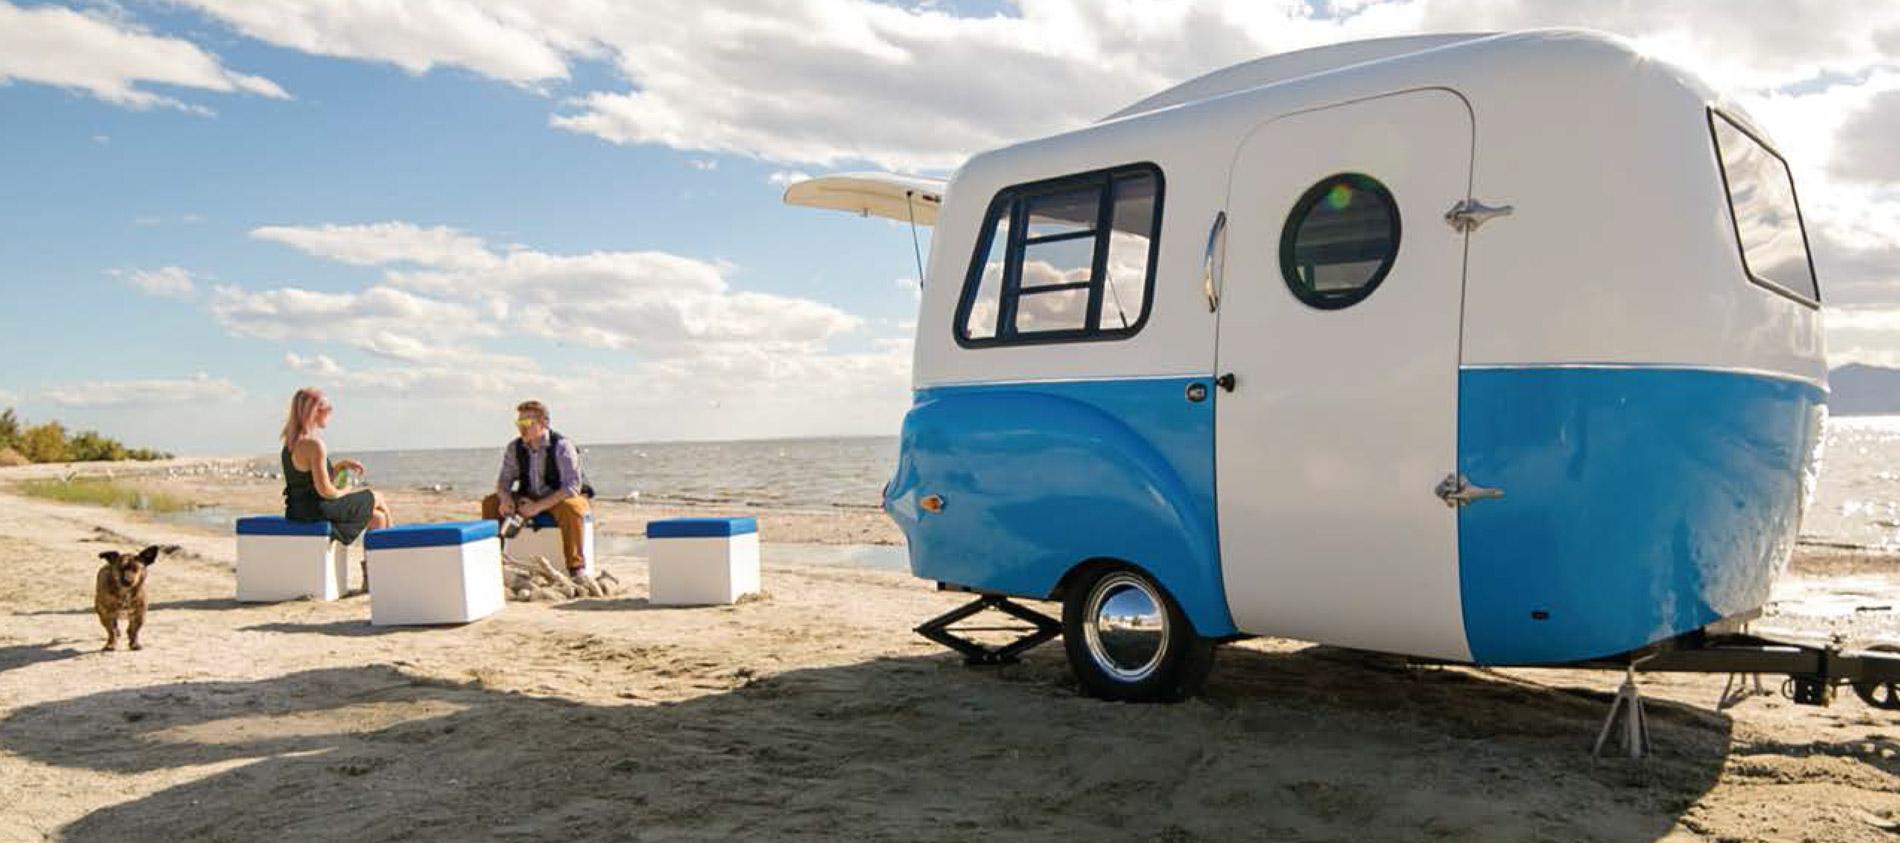 Adaptiv la caravane modulable d 39 happier camper for Salon de la caravane